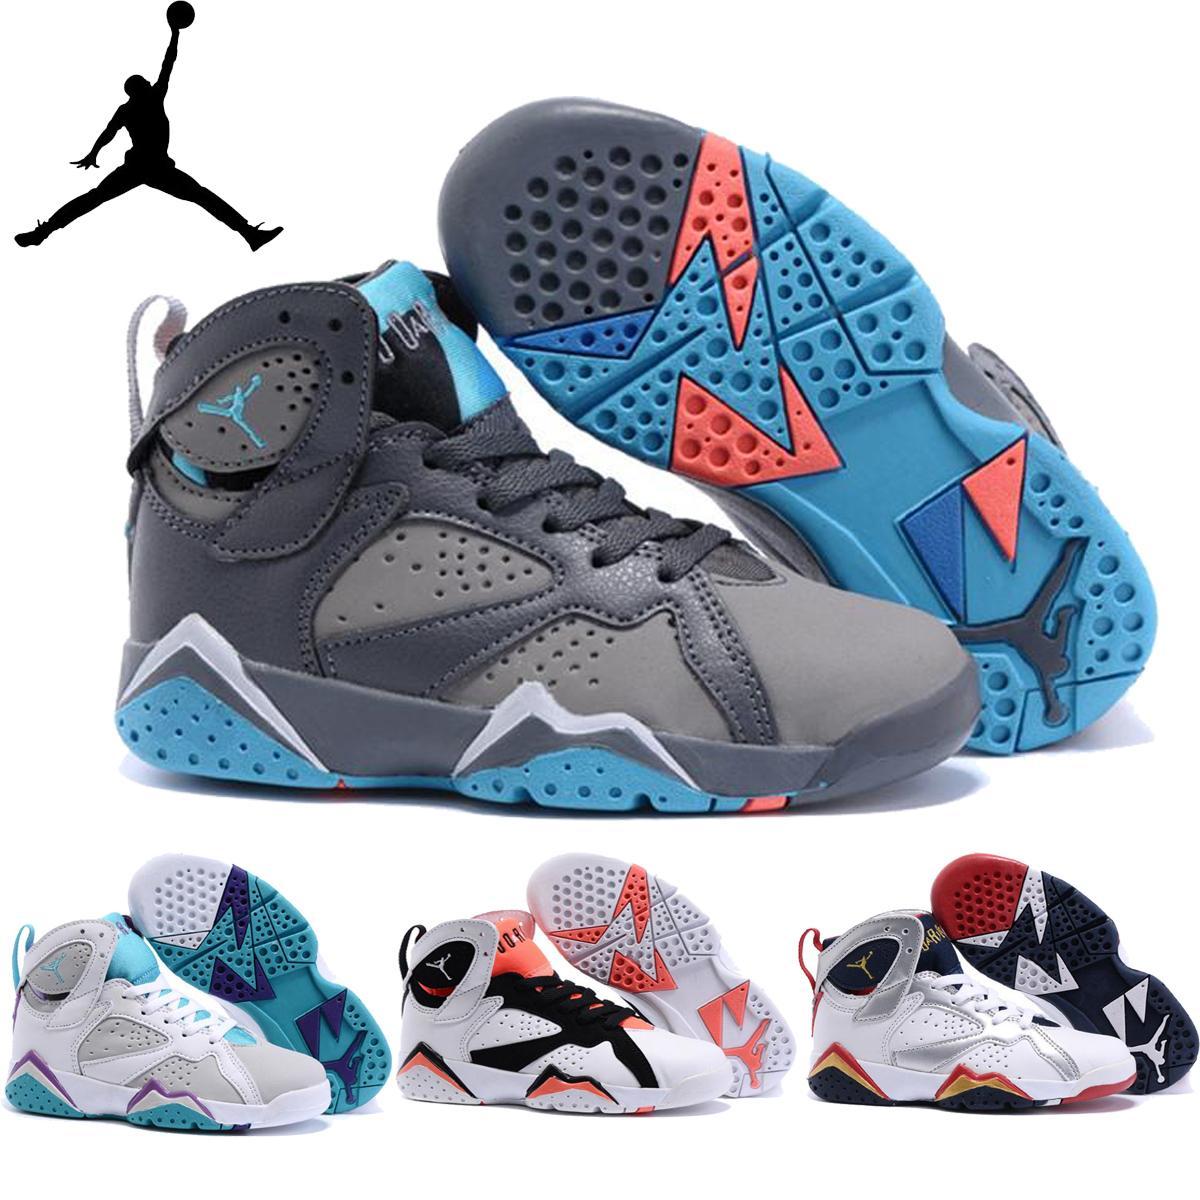 Nike Air Jordan Vii Childrens Shoes Original Basketball ...